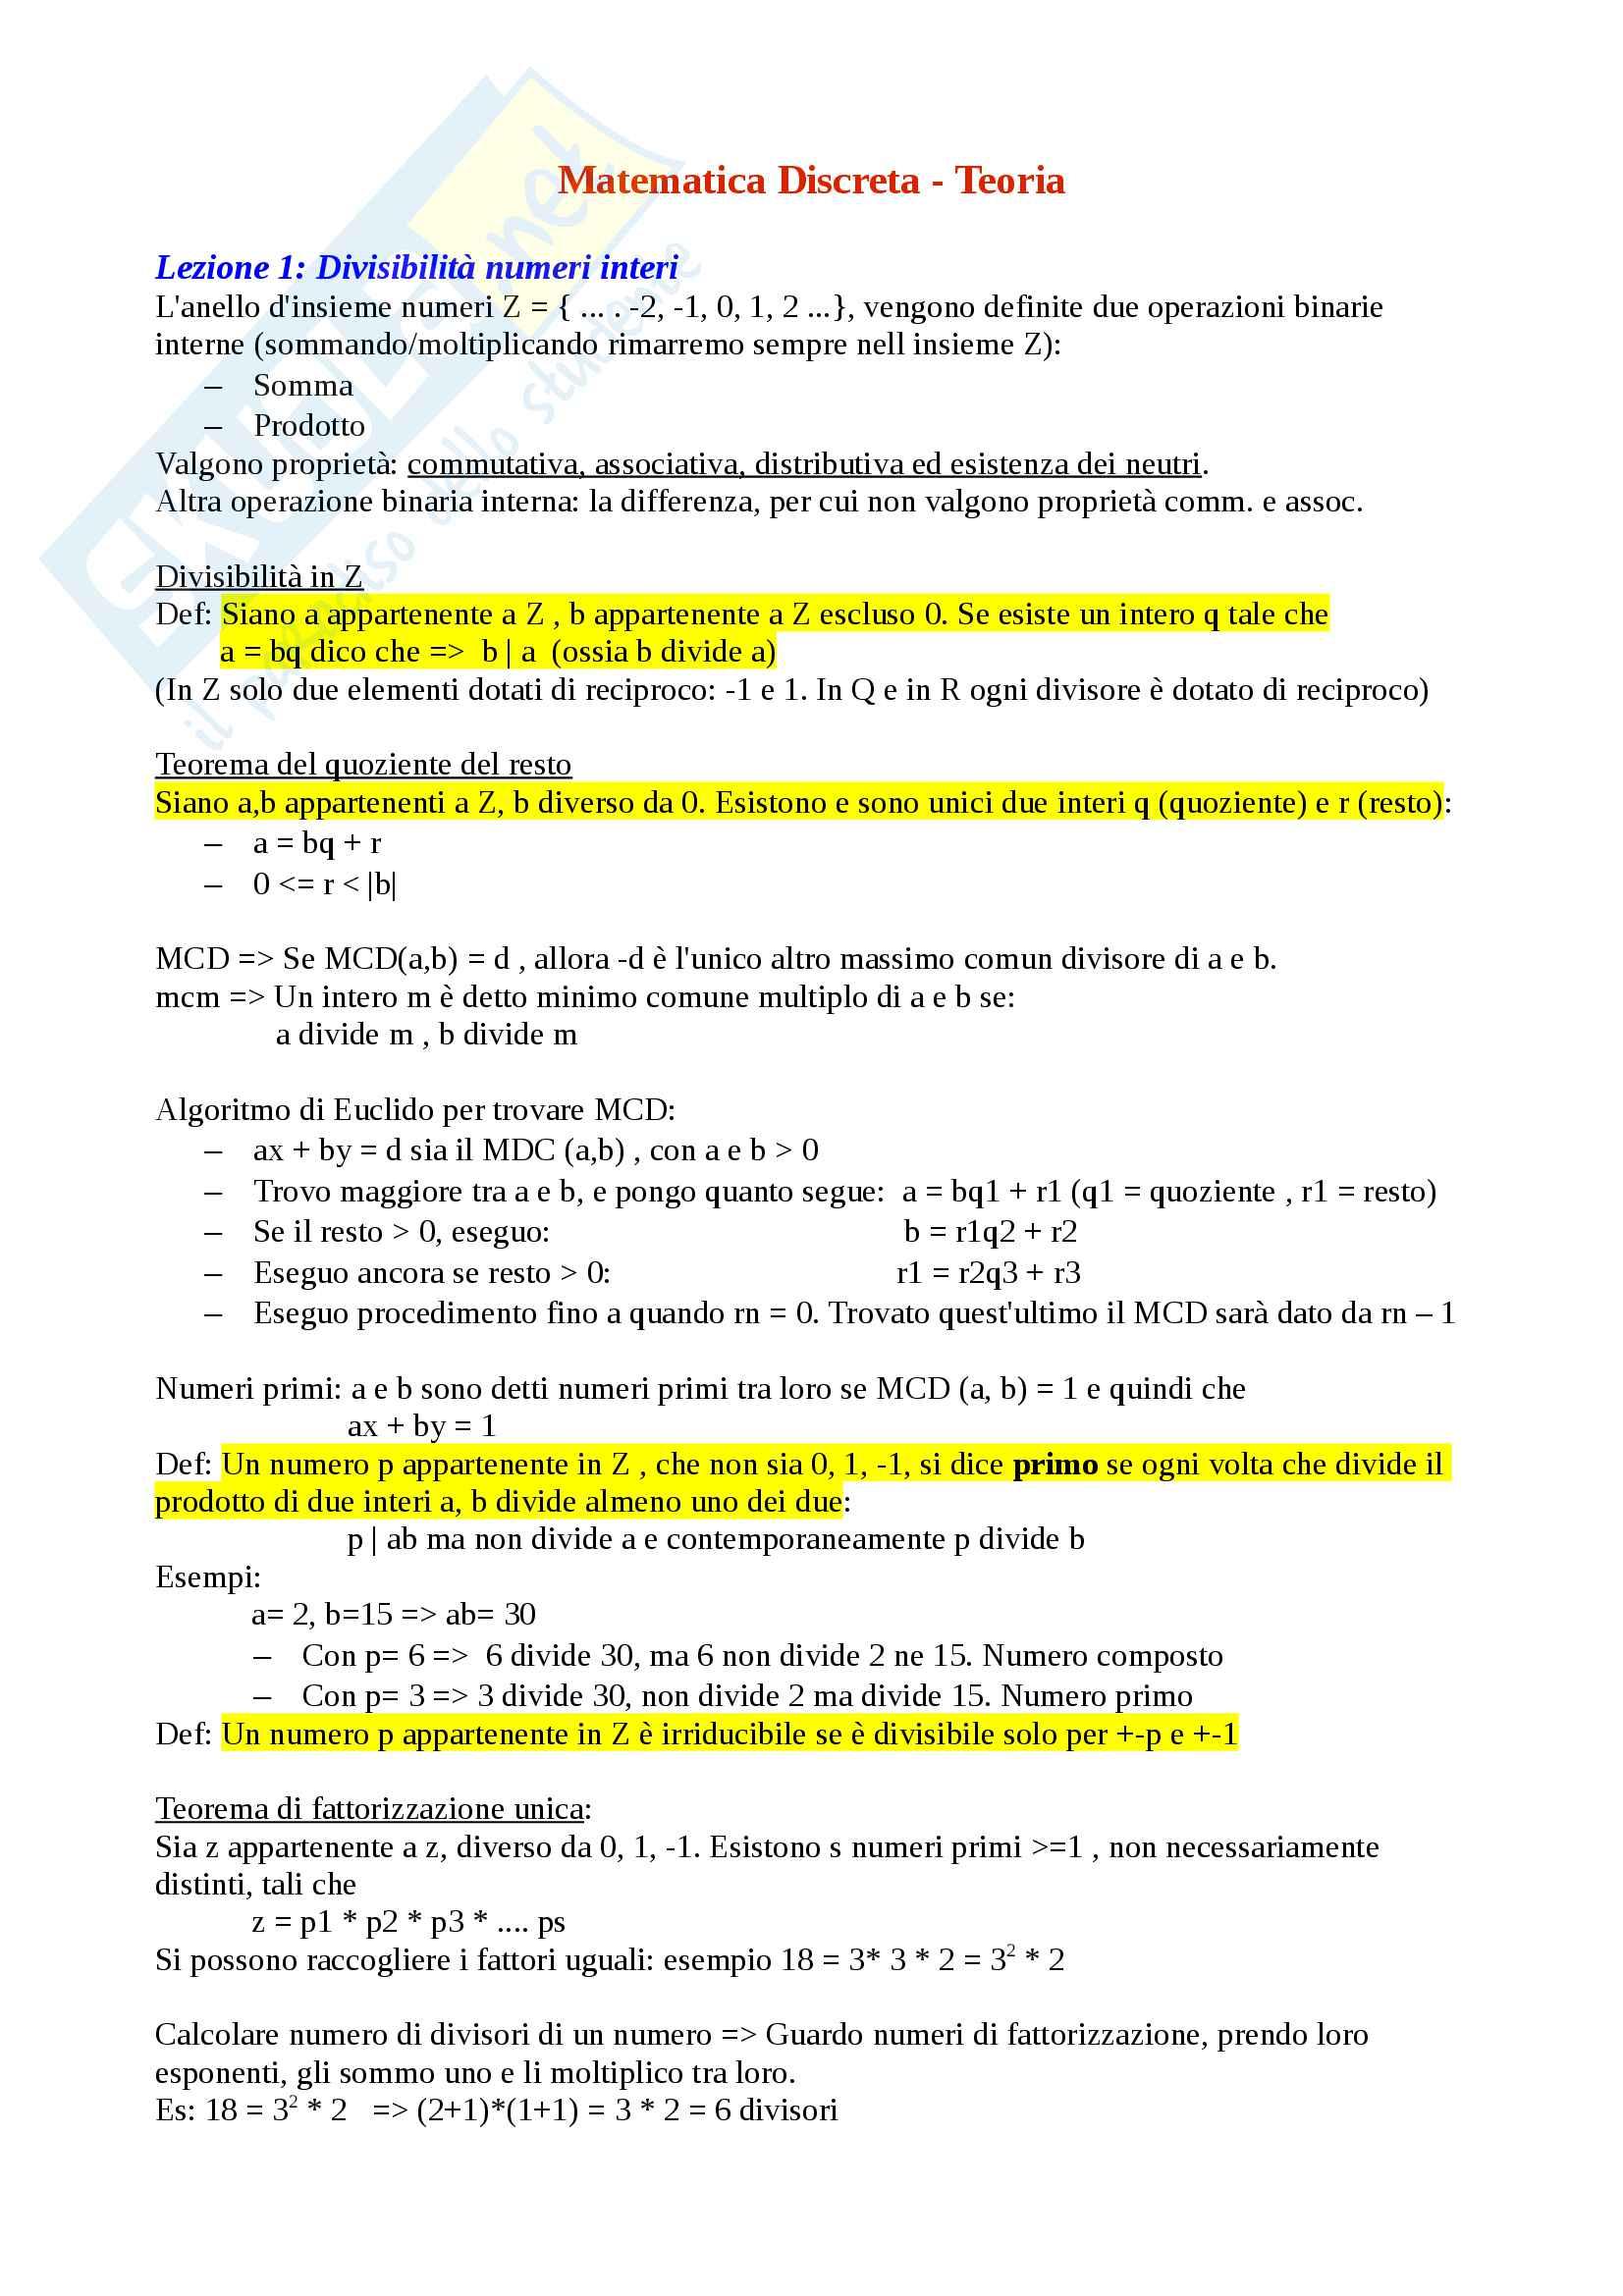 Matematica Discreta - Algebra